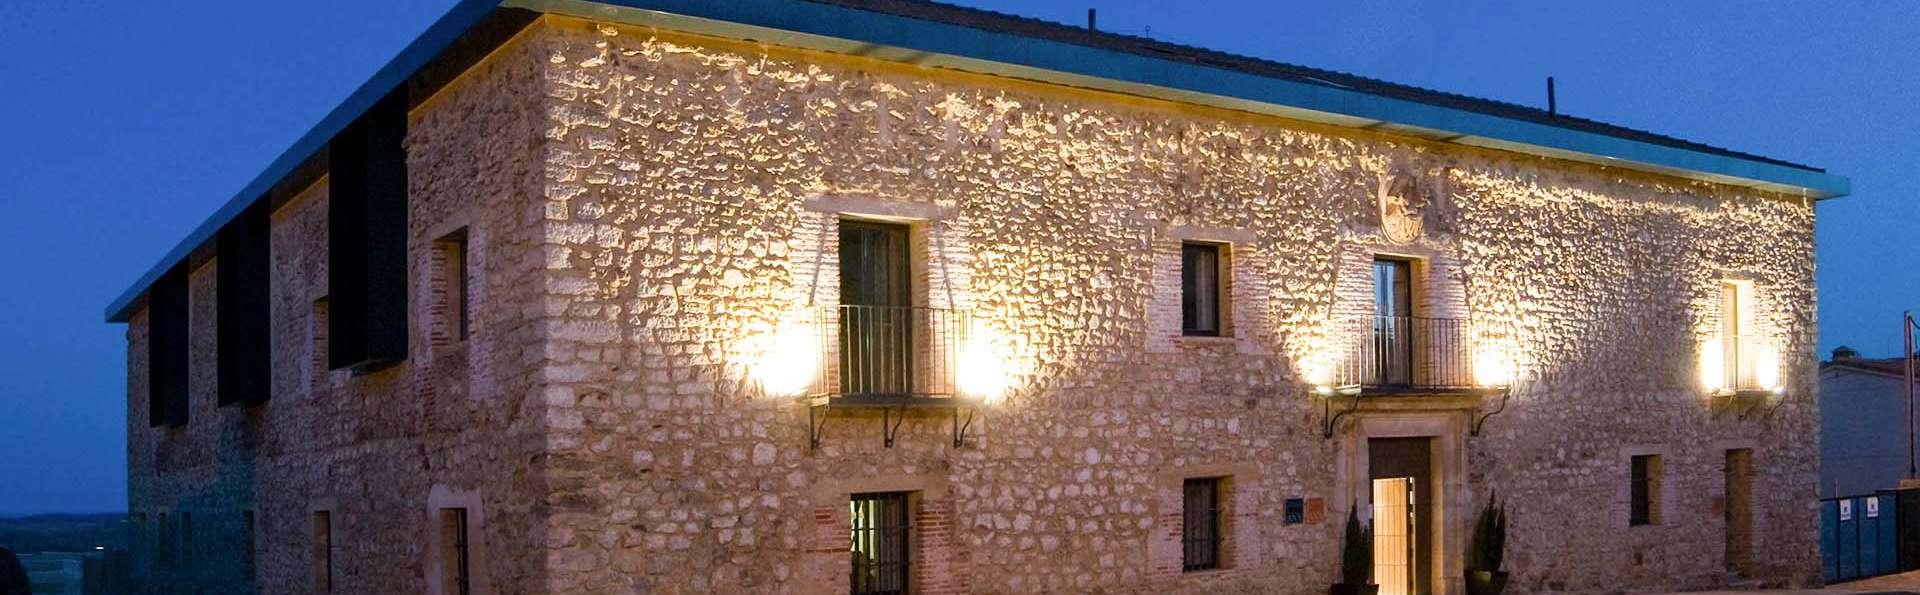 Hotel Convento Santa Ana - EDIT_fachada_noche_01.jpg